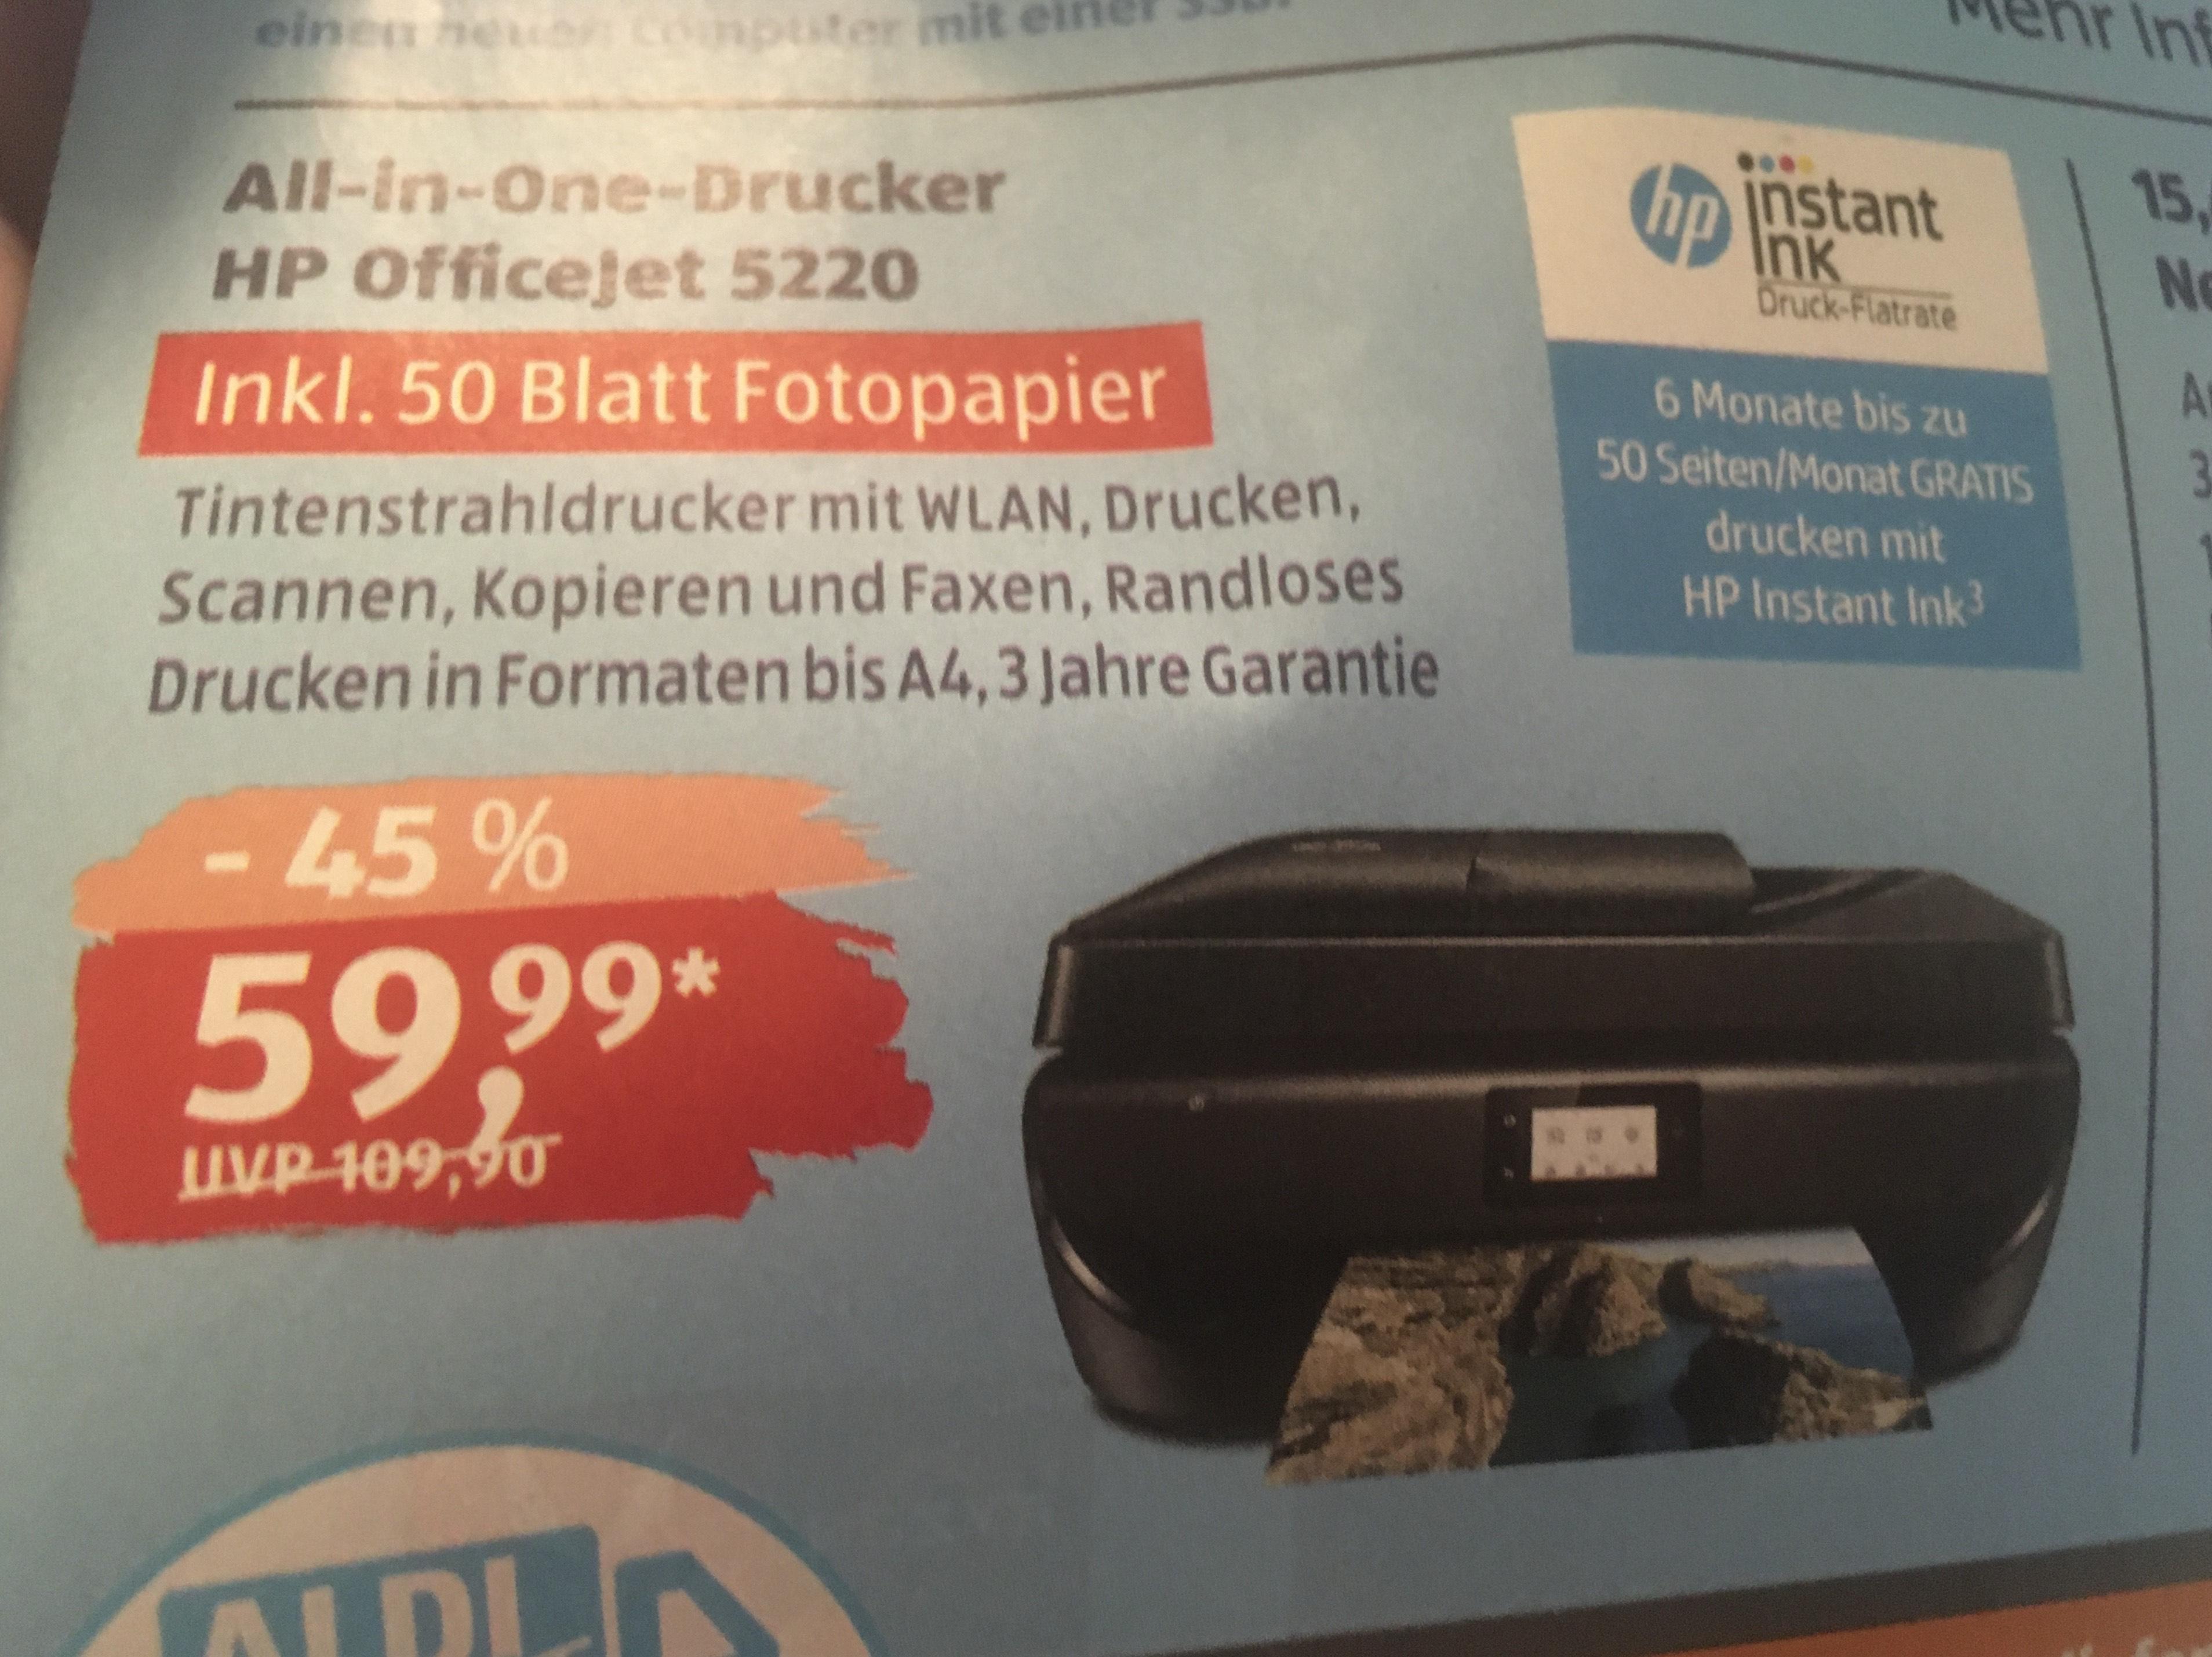 [Aldi Online ab 28.05] u.a. Drucker OfficeJet 5220 Multifunktionsgerät mit WLAN